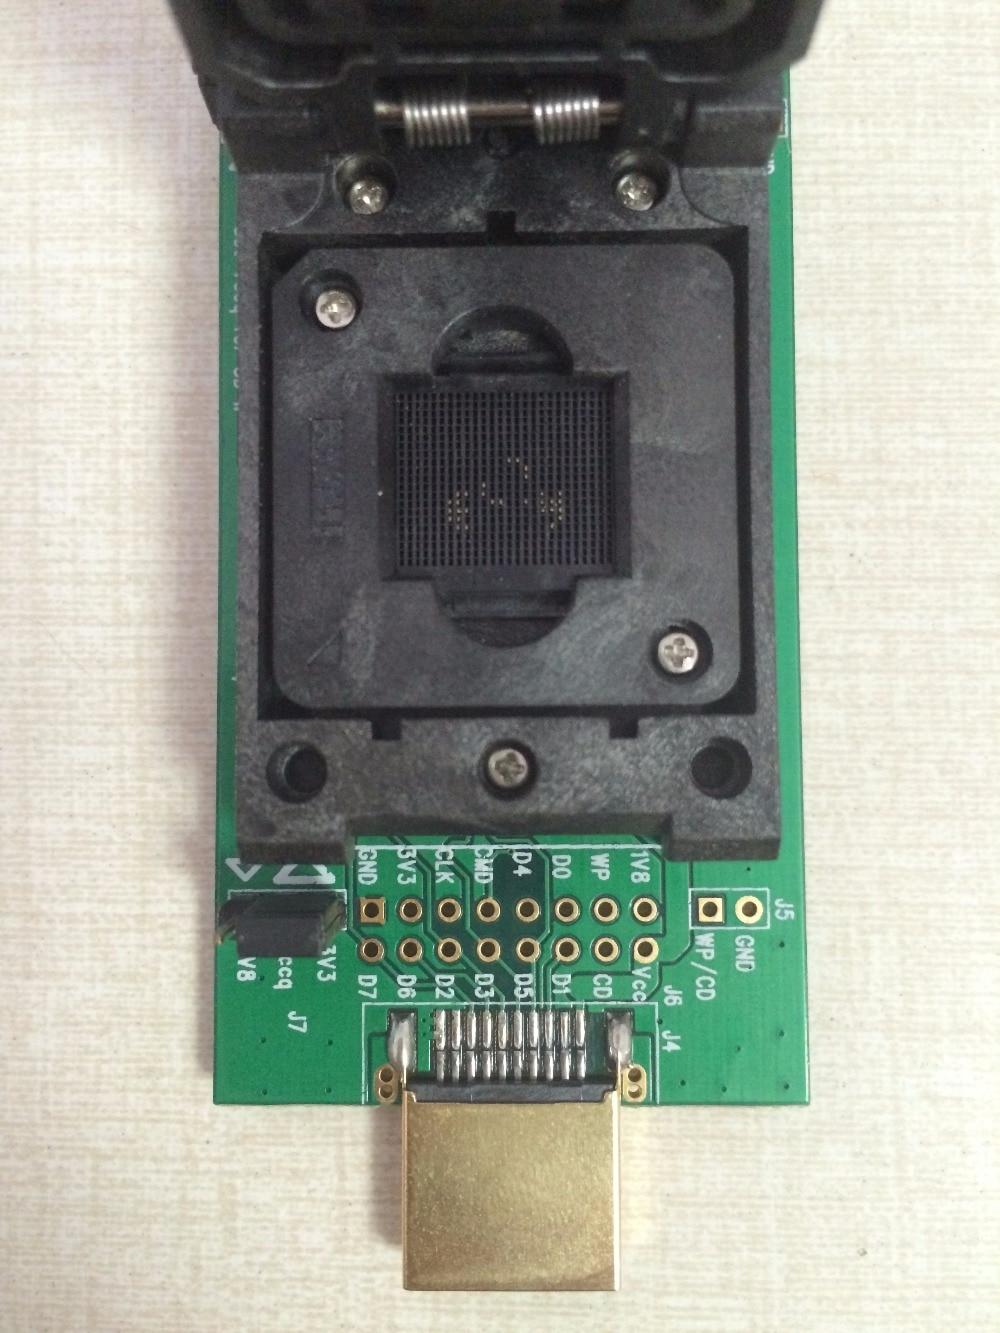 Купить с кэшбэком eMMC socket test flash chip eMMC153 socket eMMC169 BGA169 socket BGA153 Android phone flash data backup data recovery SD HDMI